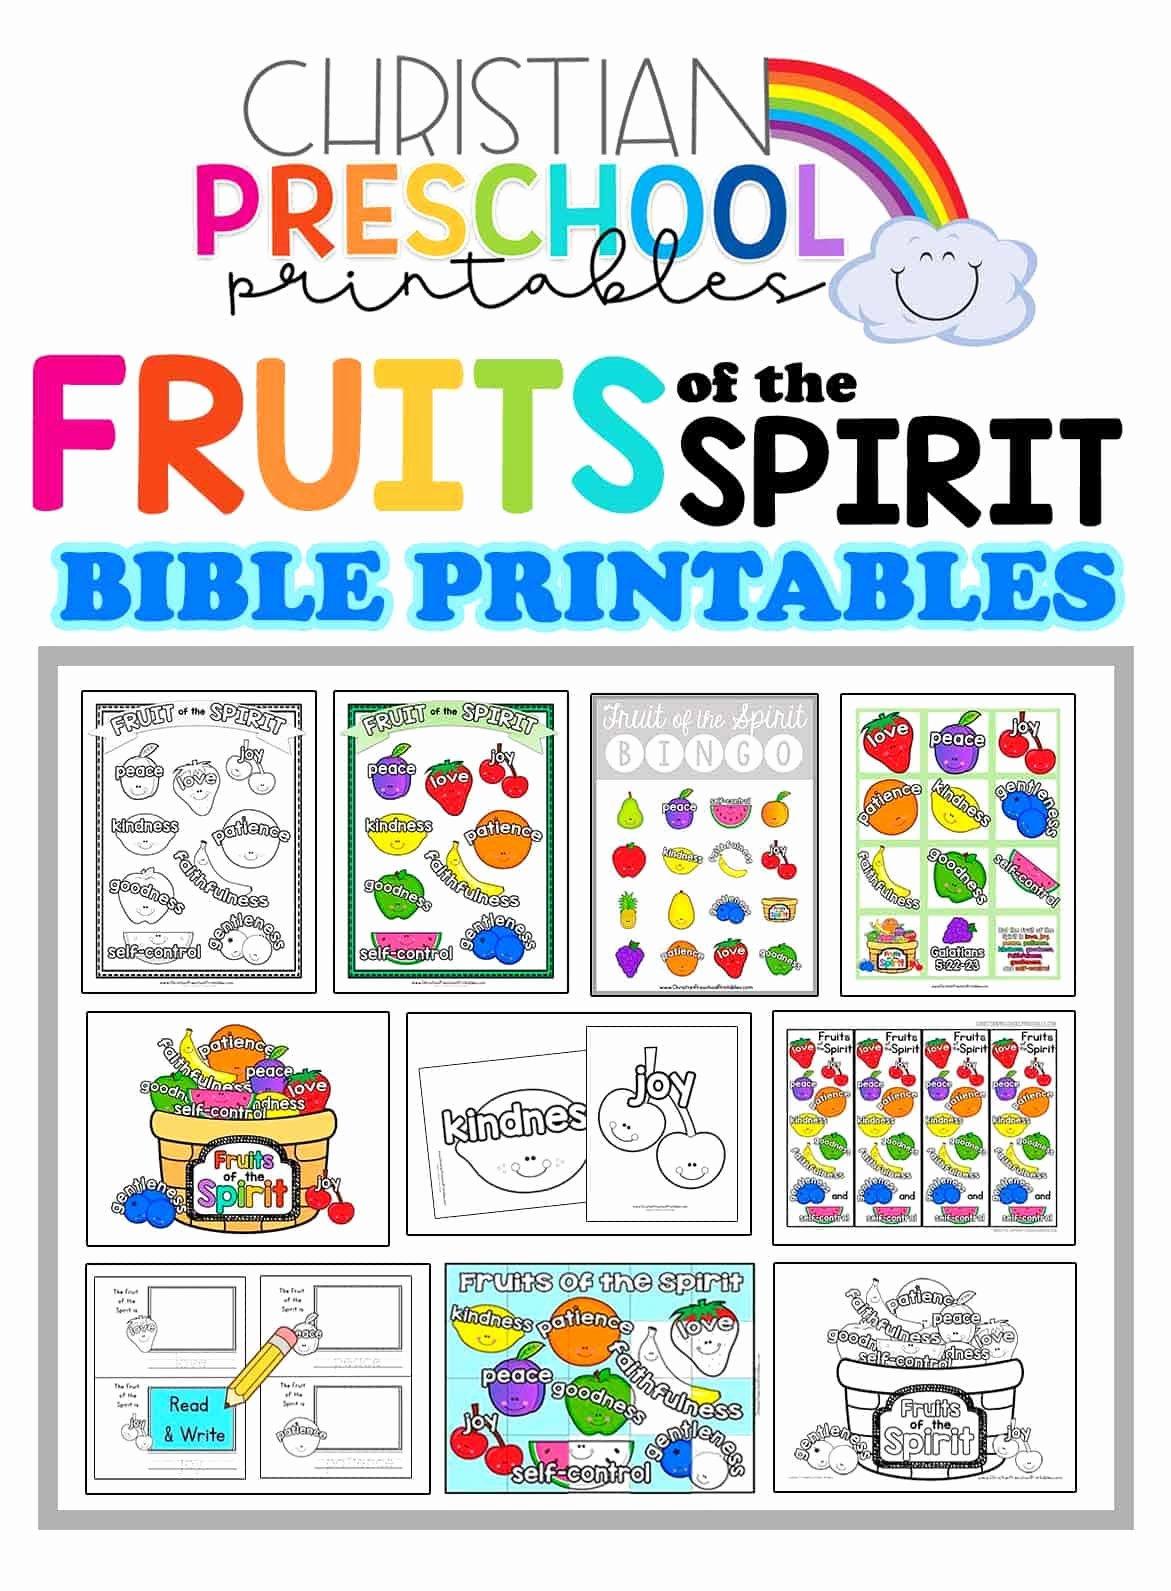 Fruits Of the Spirit Worksheet New Fruit Of the Spirit Printables Christian Preschool Printables